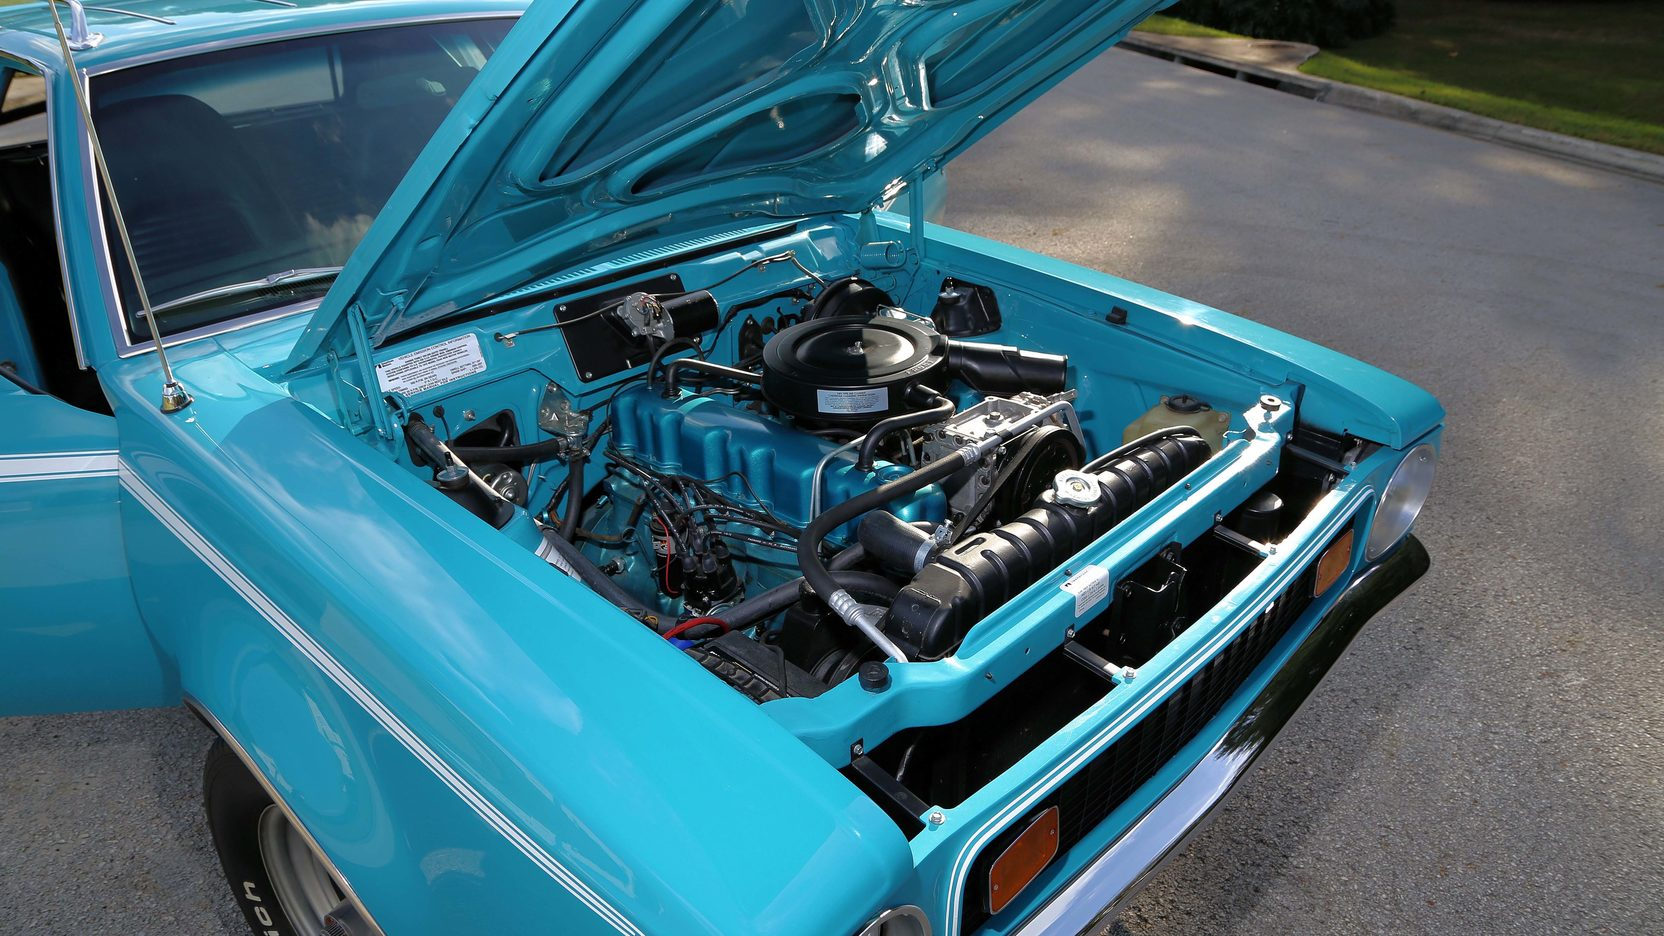 1972 AMC Gremlin X engine